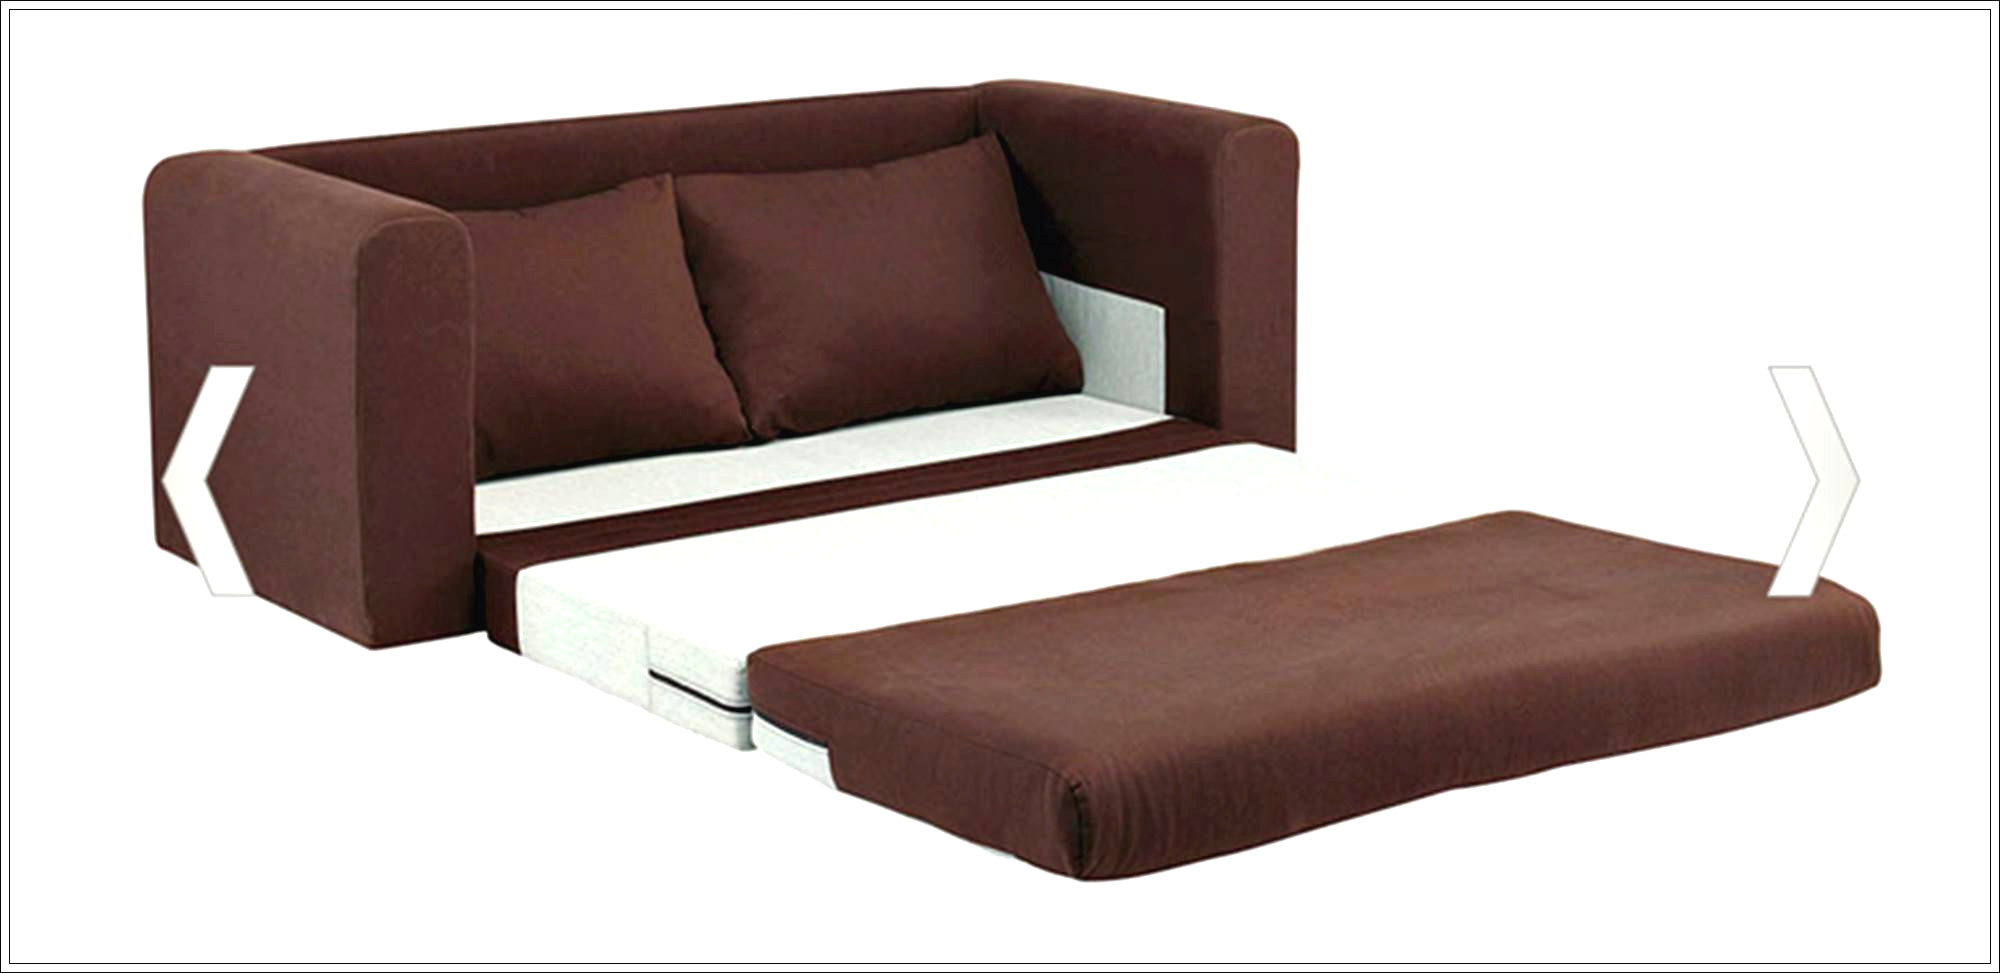 Ikea Jeté De Lit Luxe Stock Clic Clac Ikea Pas Cher Canap Convertible Clic Clac Ikea Ikea Clic